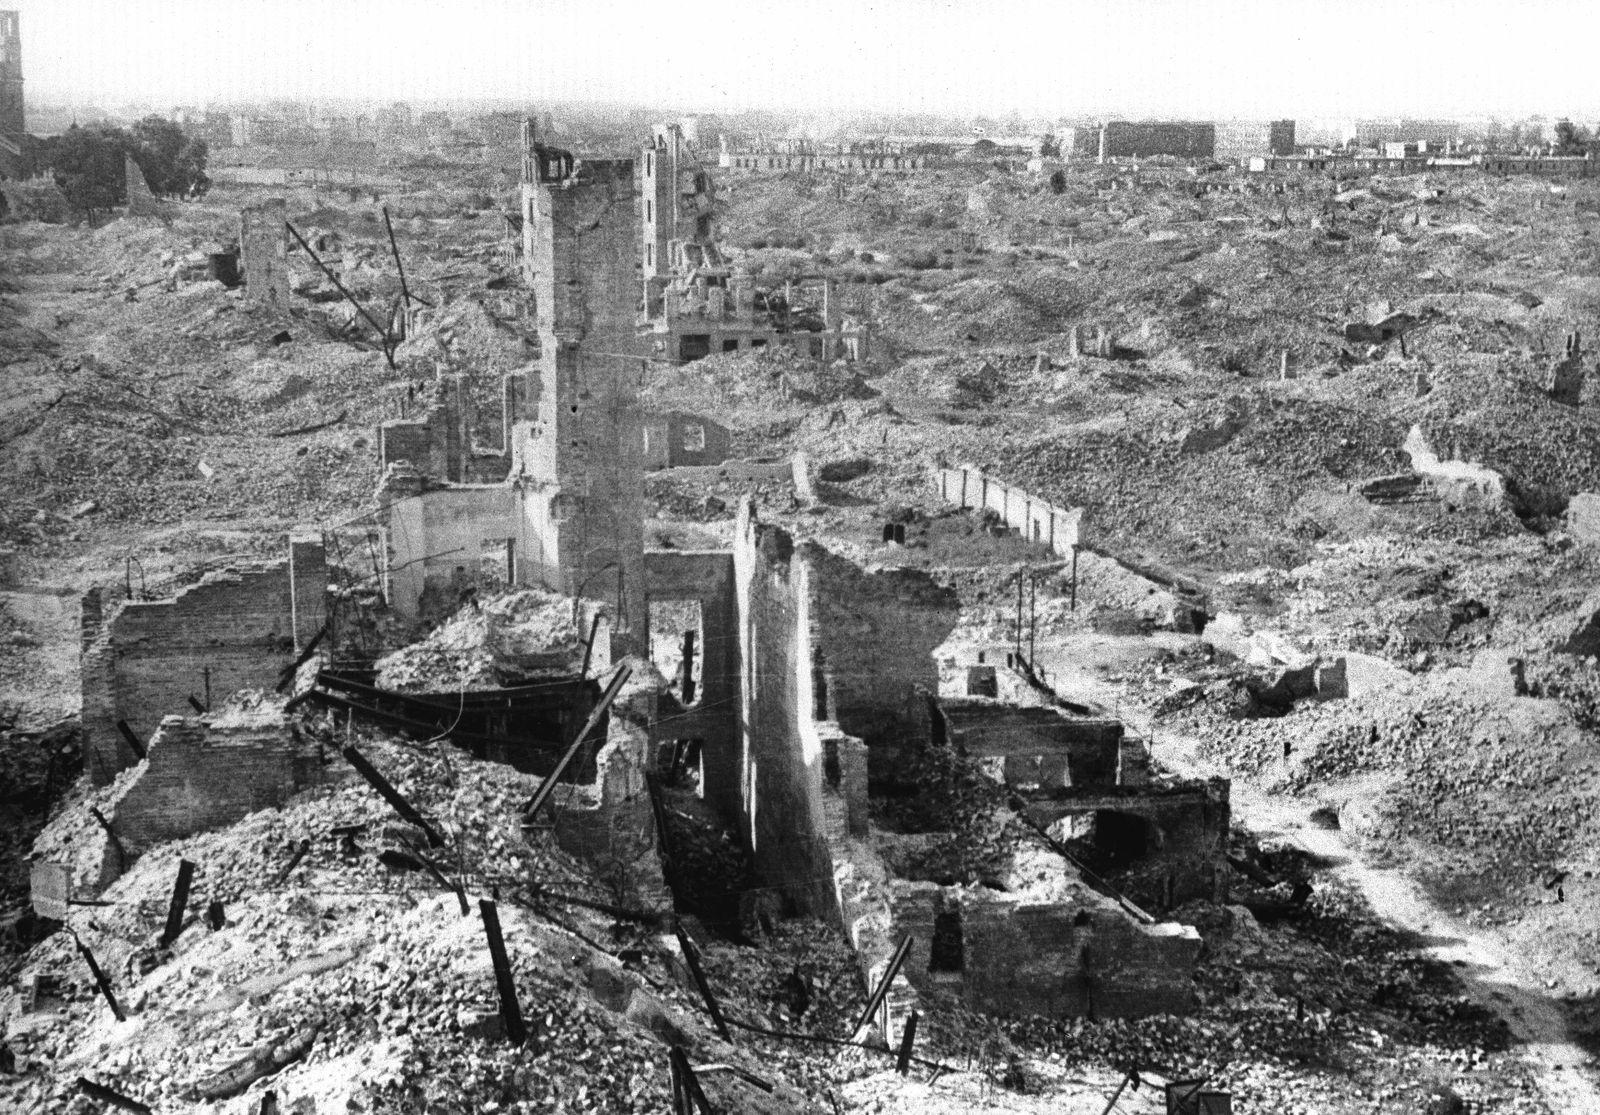 World War II. Ruins of